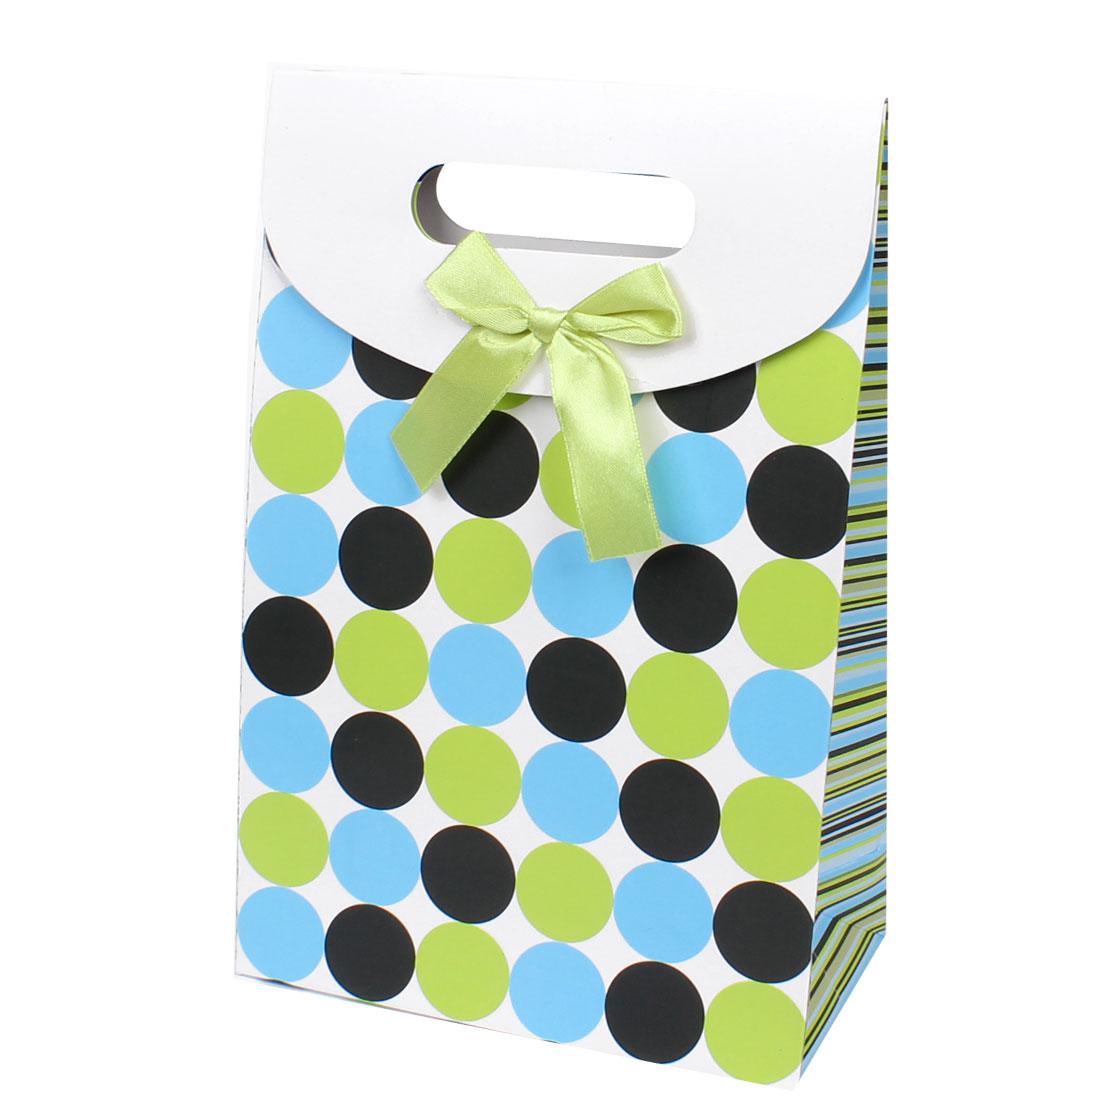 Green Blue Black Circle Printed Foldup White Gift Paper Bag 24x10x31cm